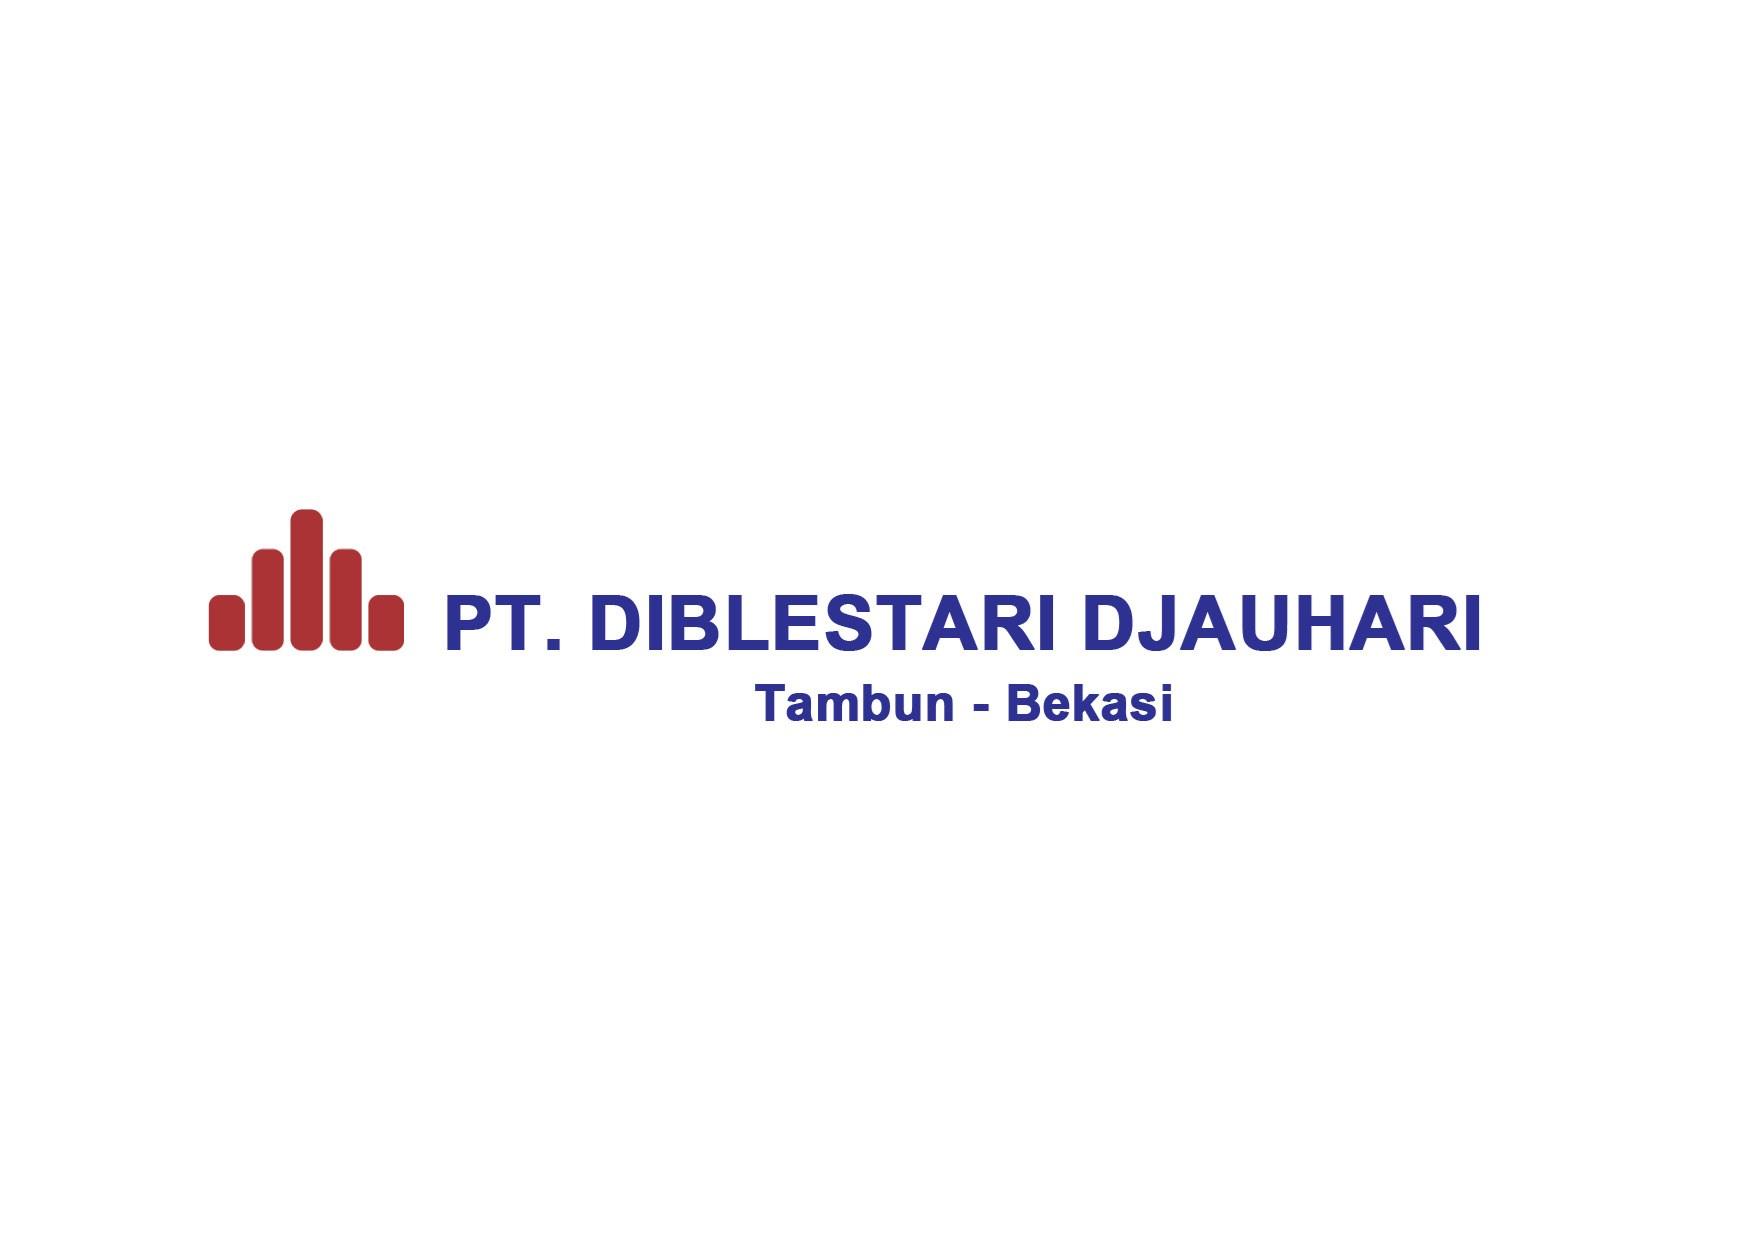 Diblestari Djauhari